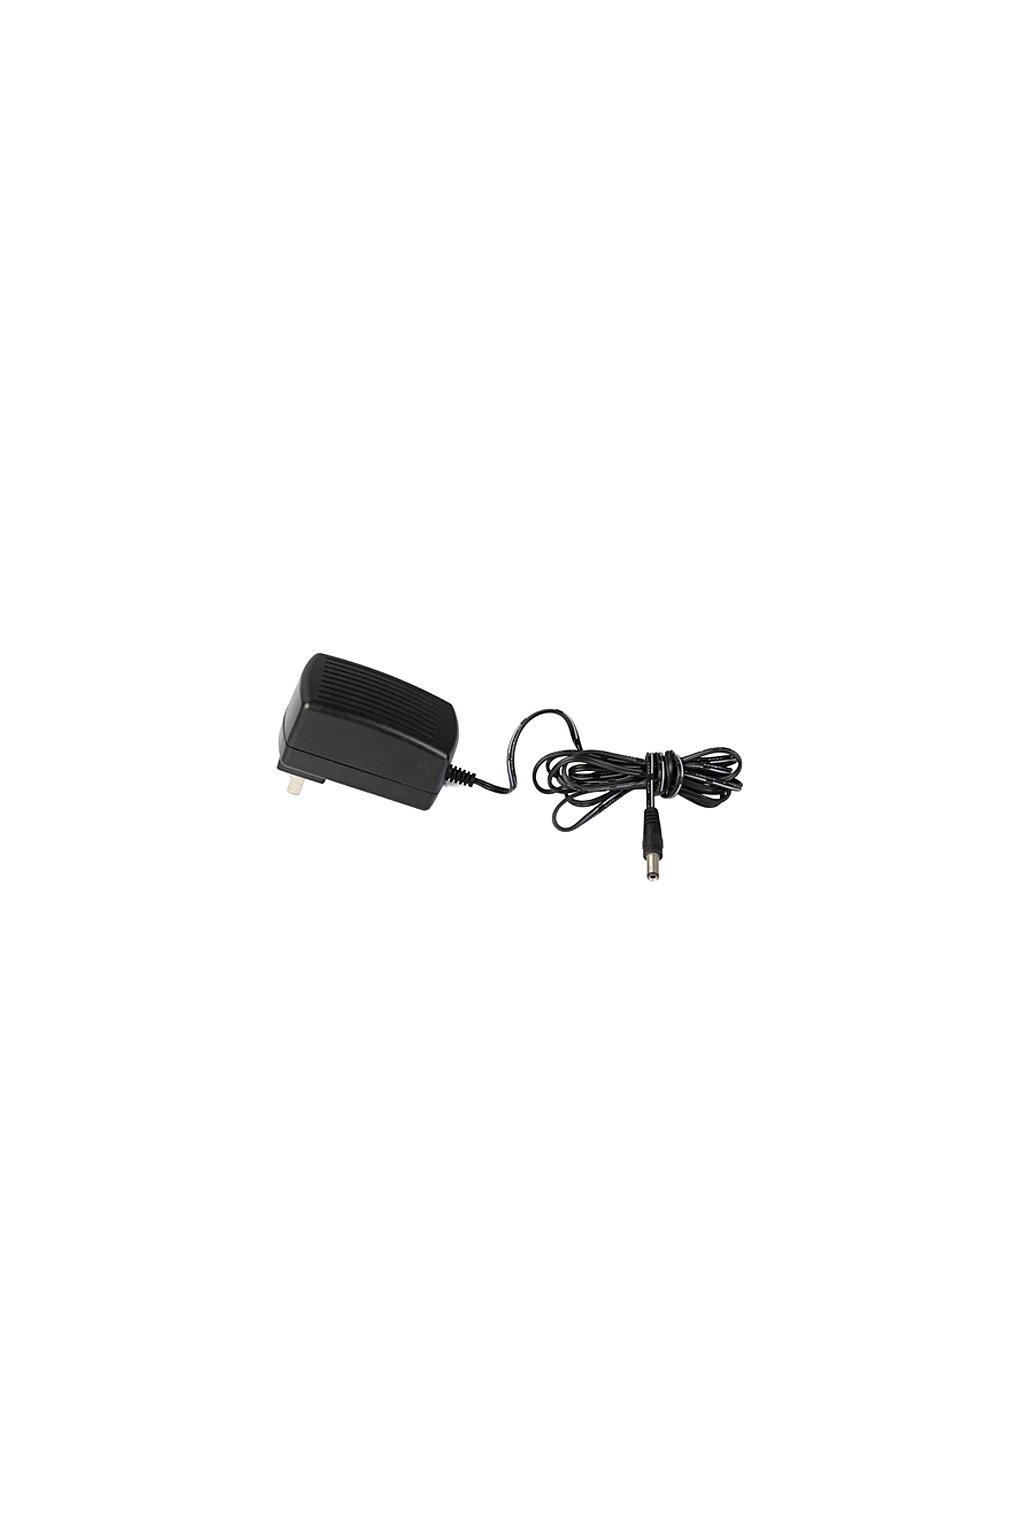 Duoro Xclean hálózati adapter